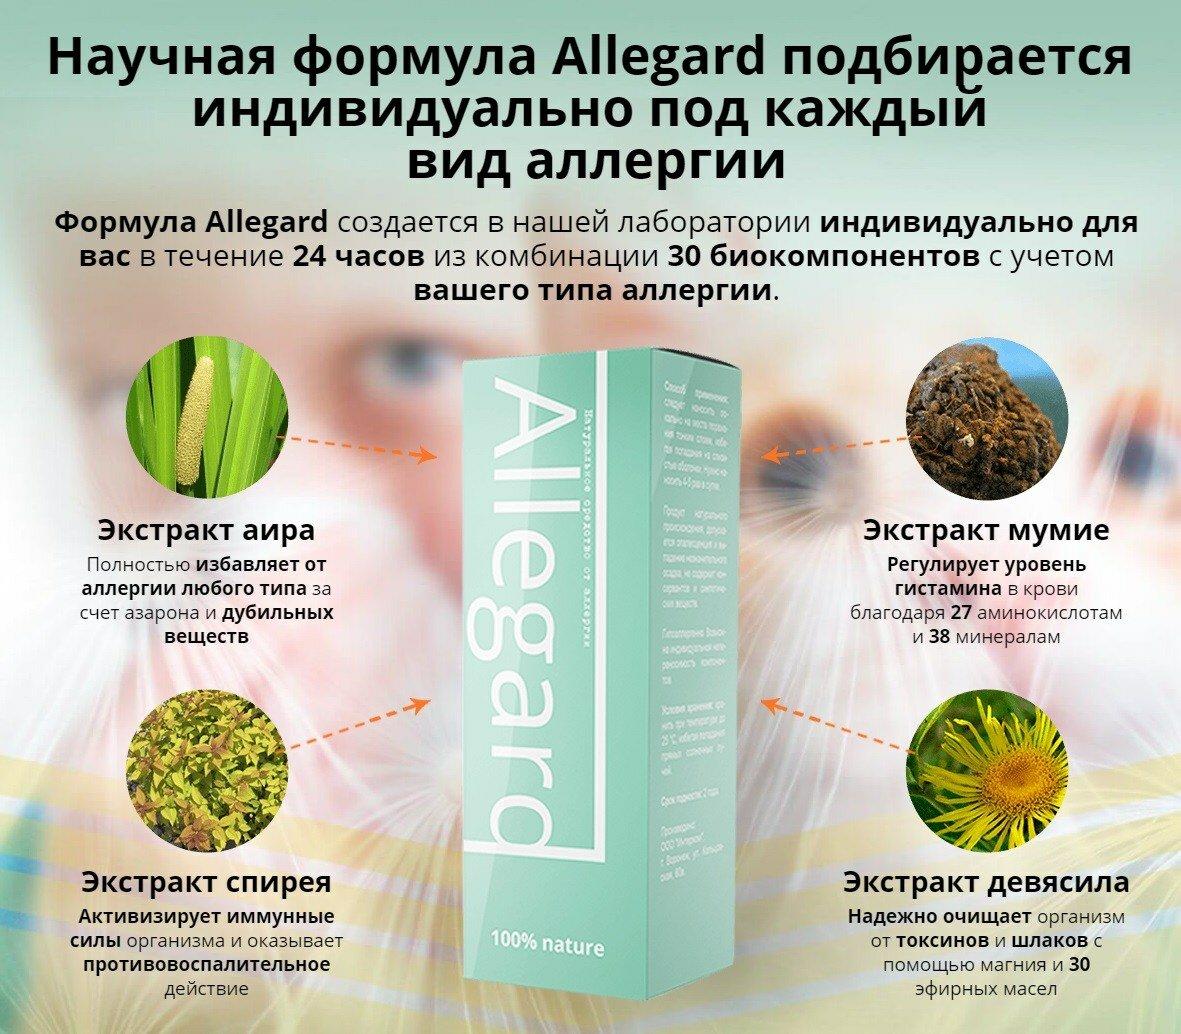 Allegard от аллергии в Твери